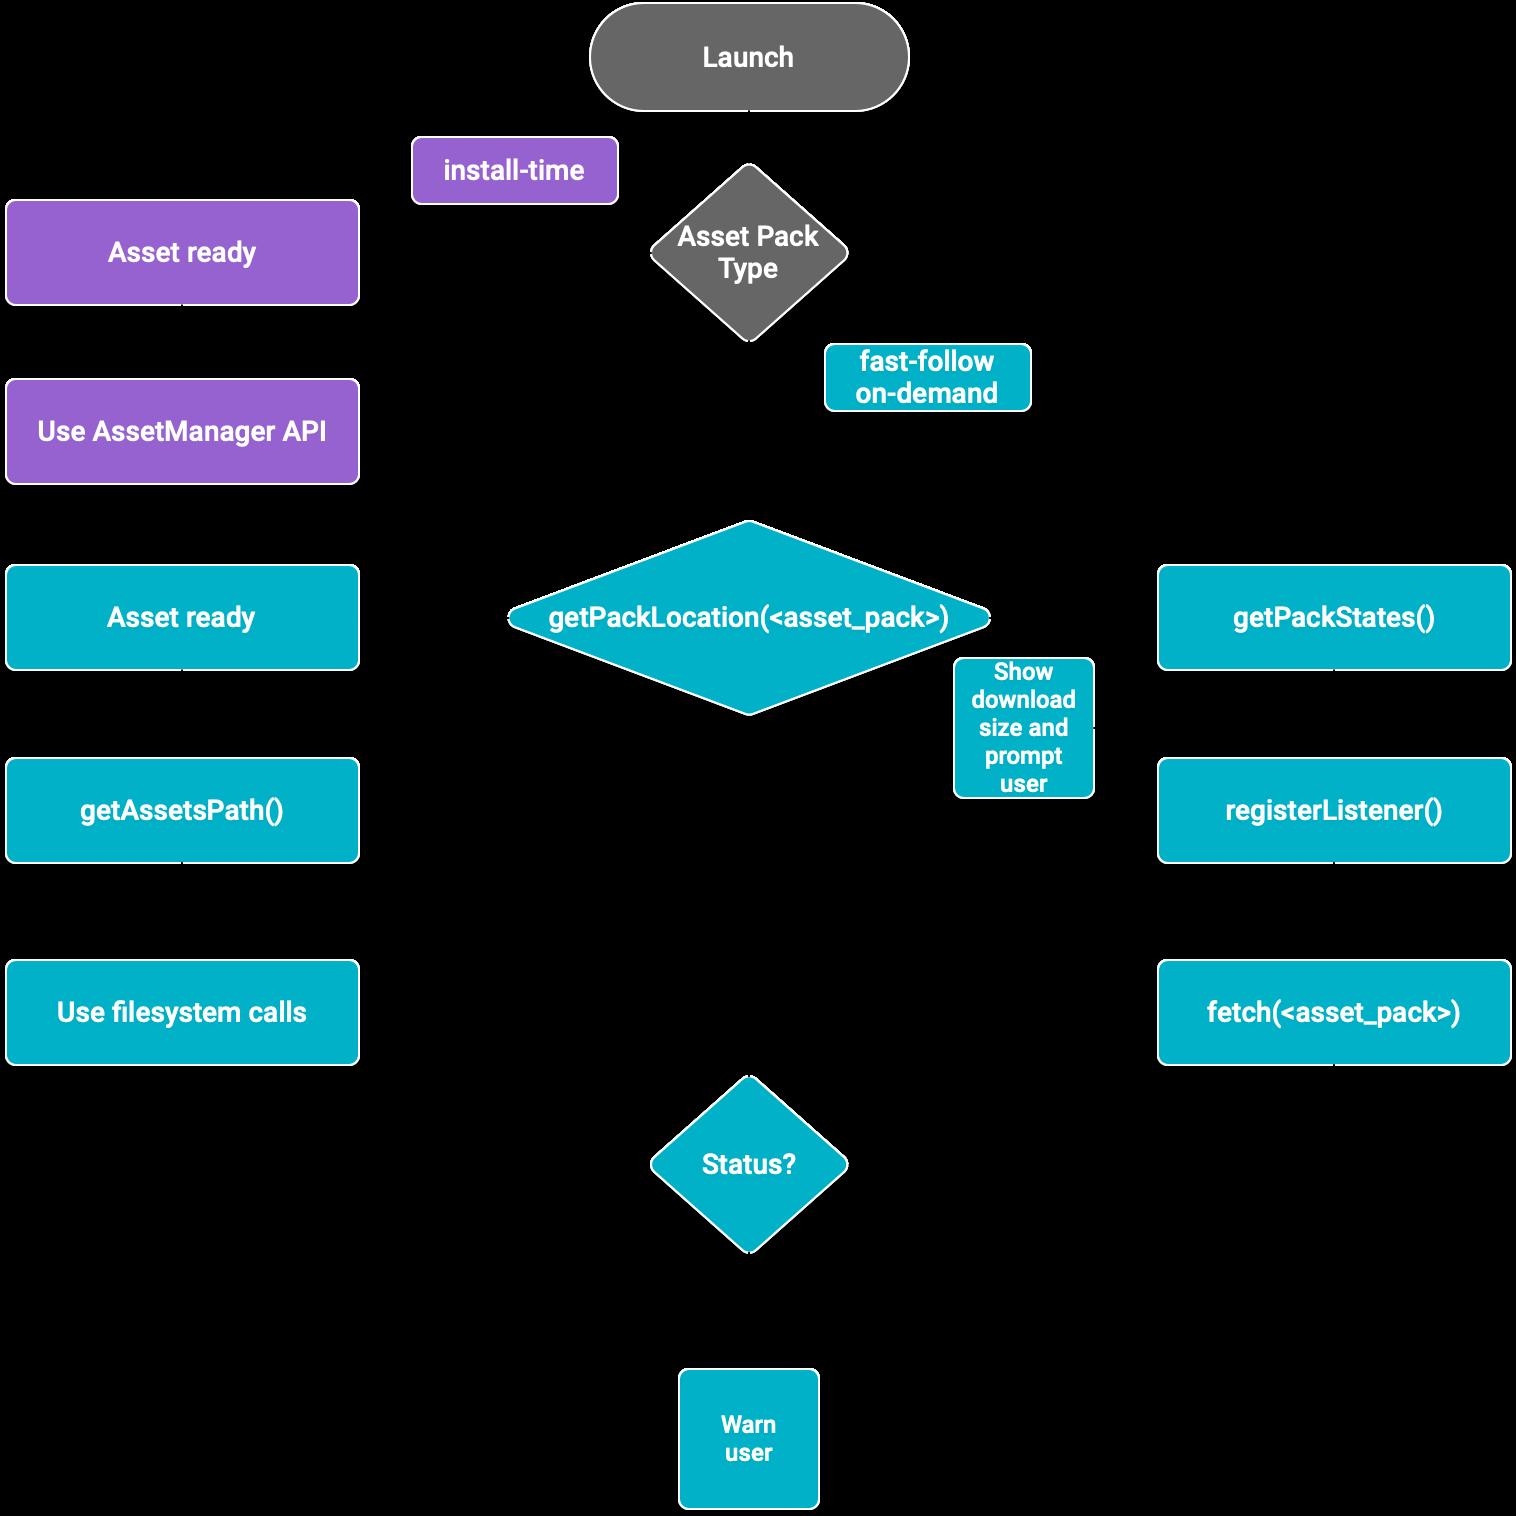 Asset pack flow diagram for the Java programming language